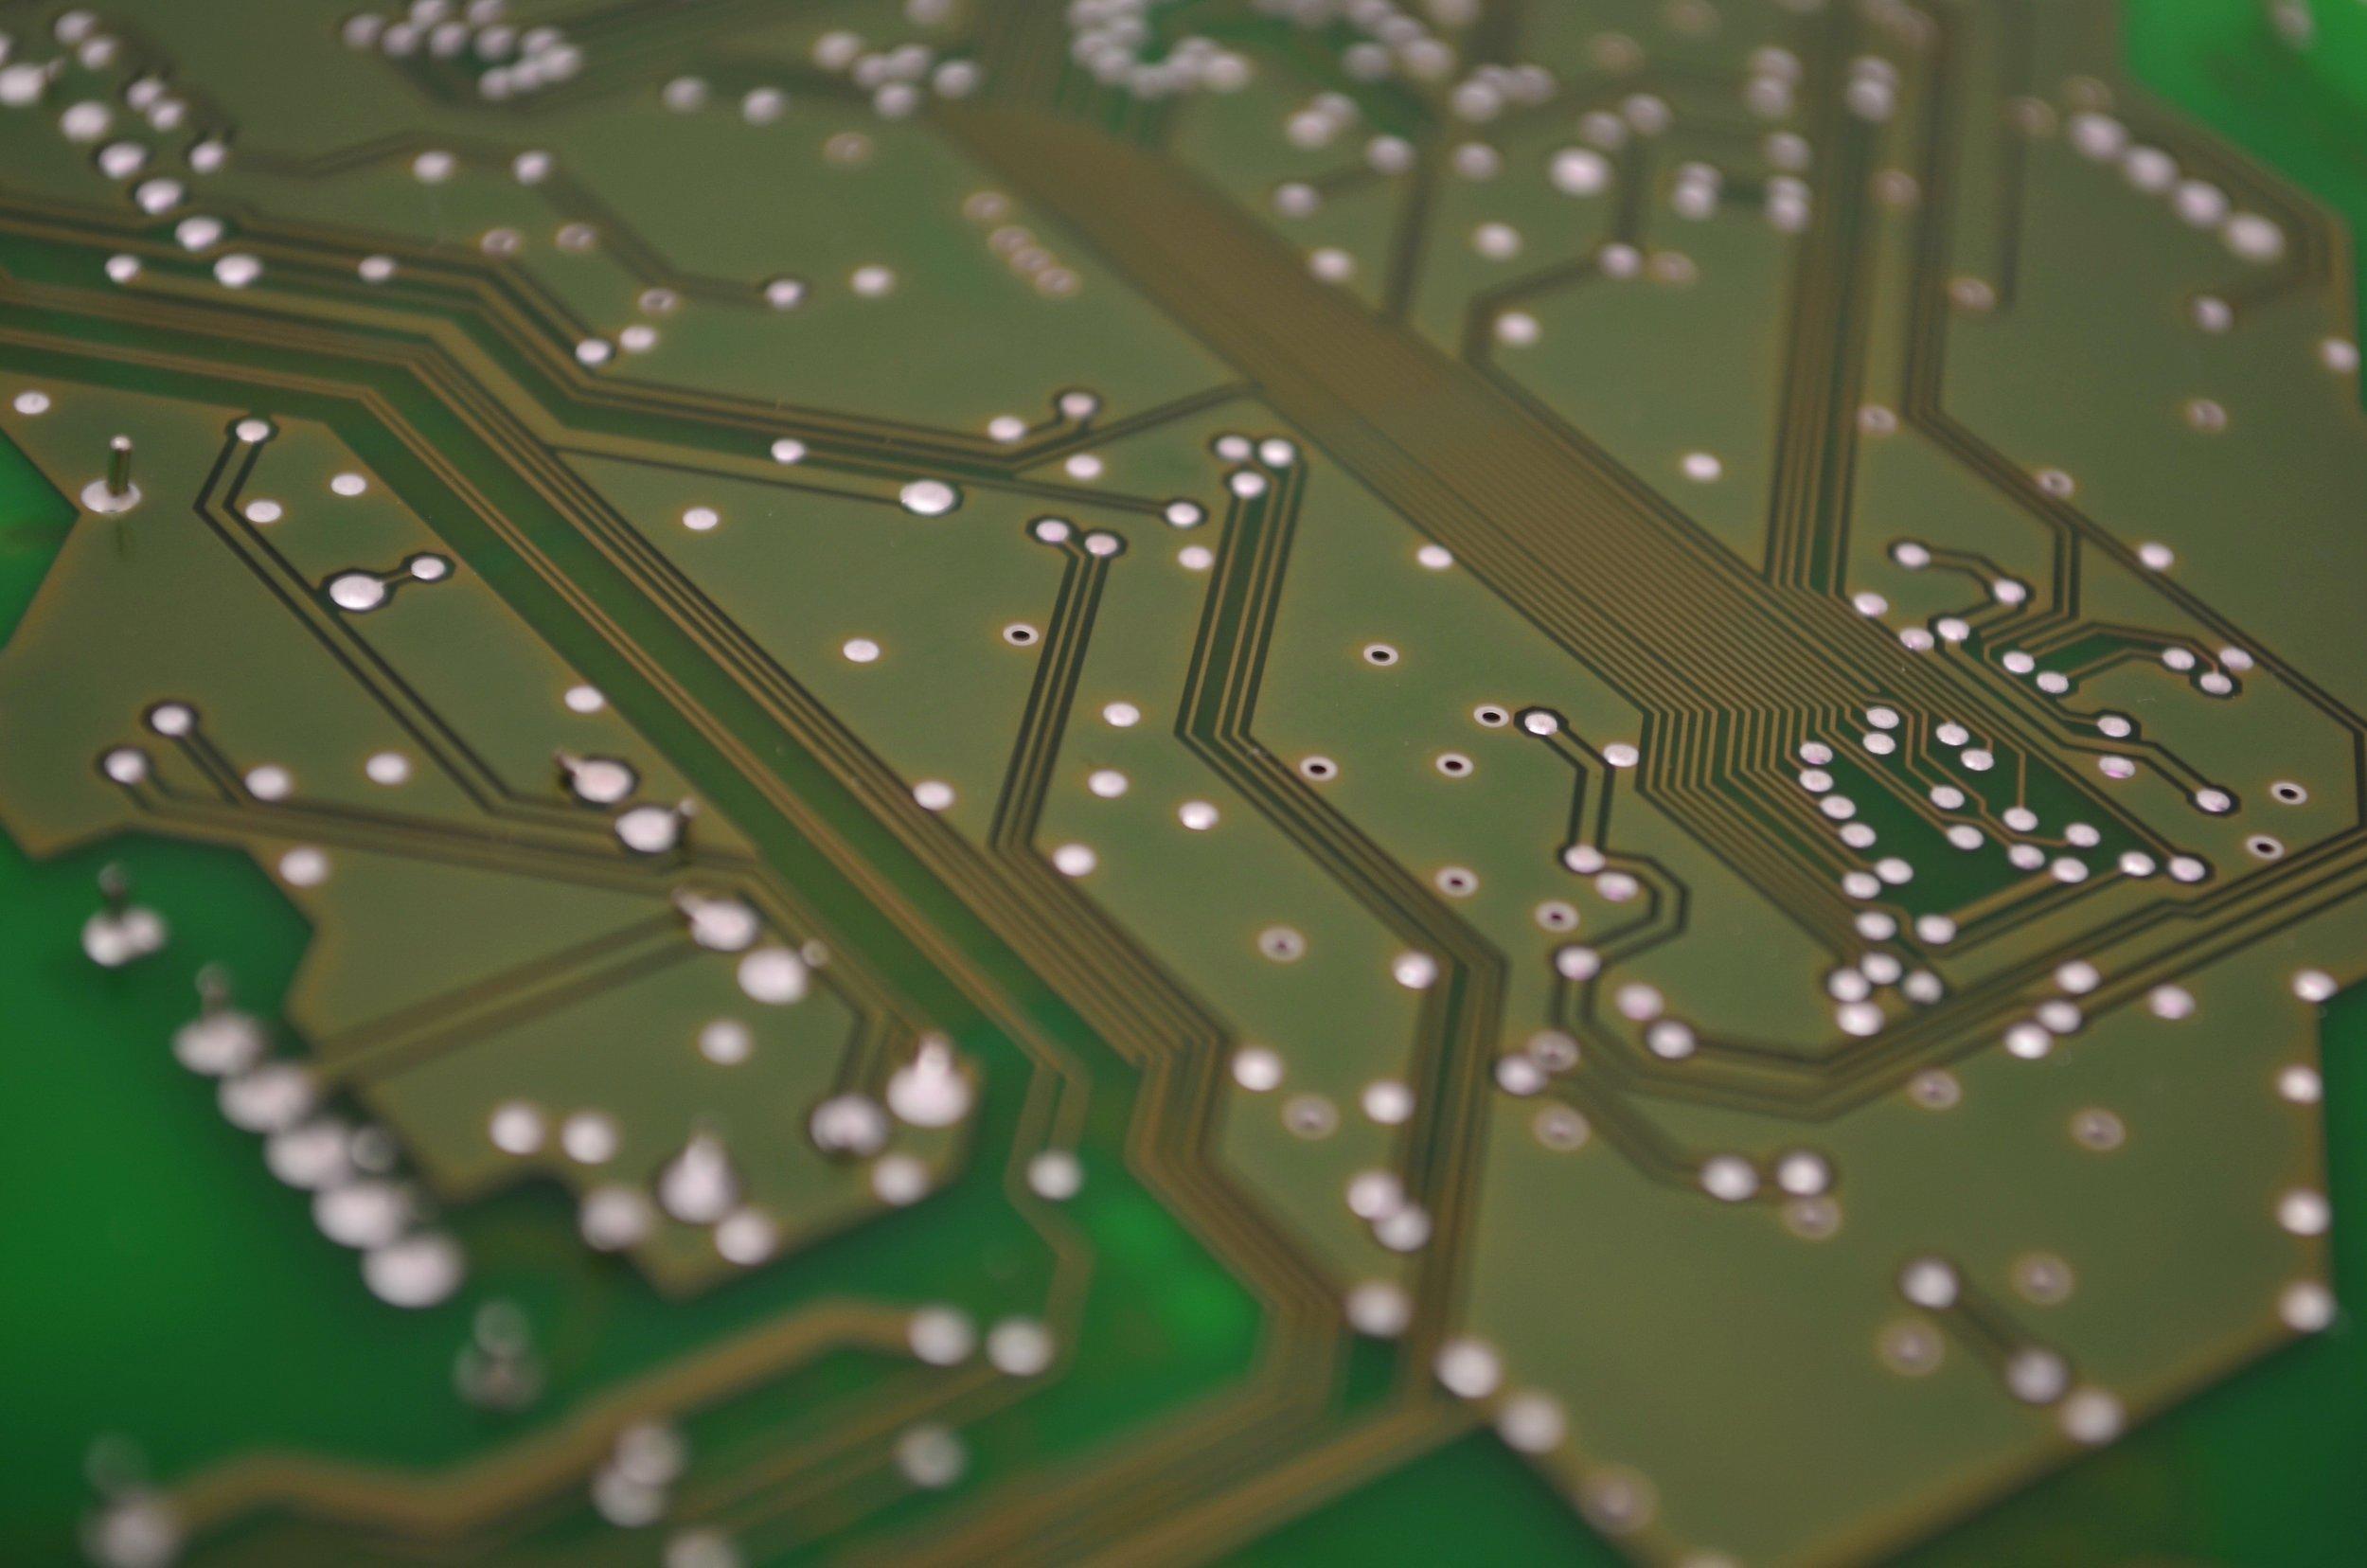 Copy of ai-artificial-intelligence-board-326461.jpg